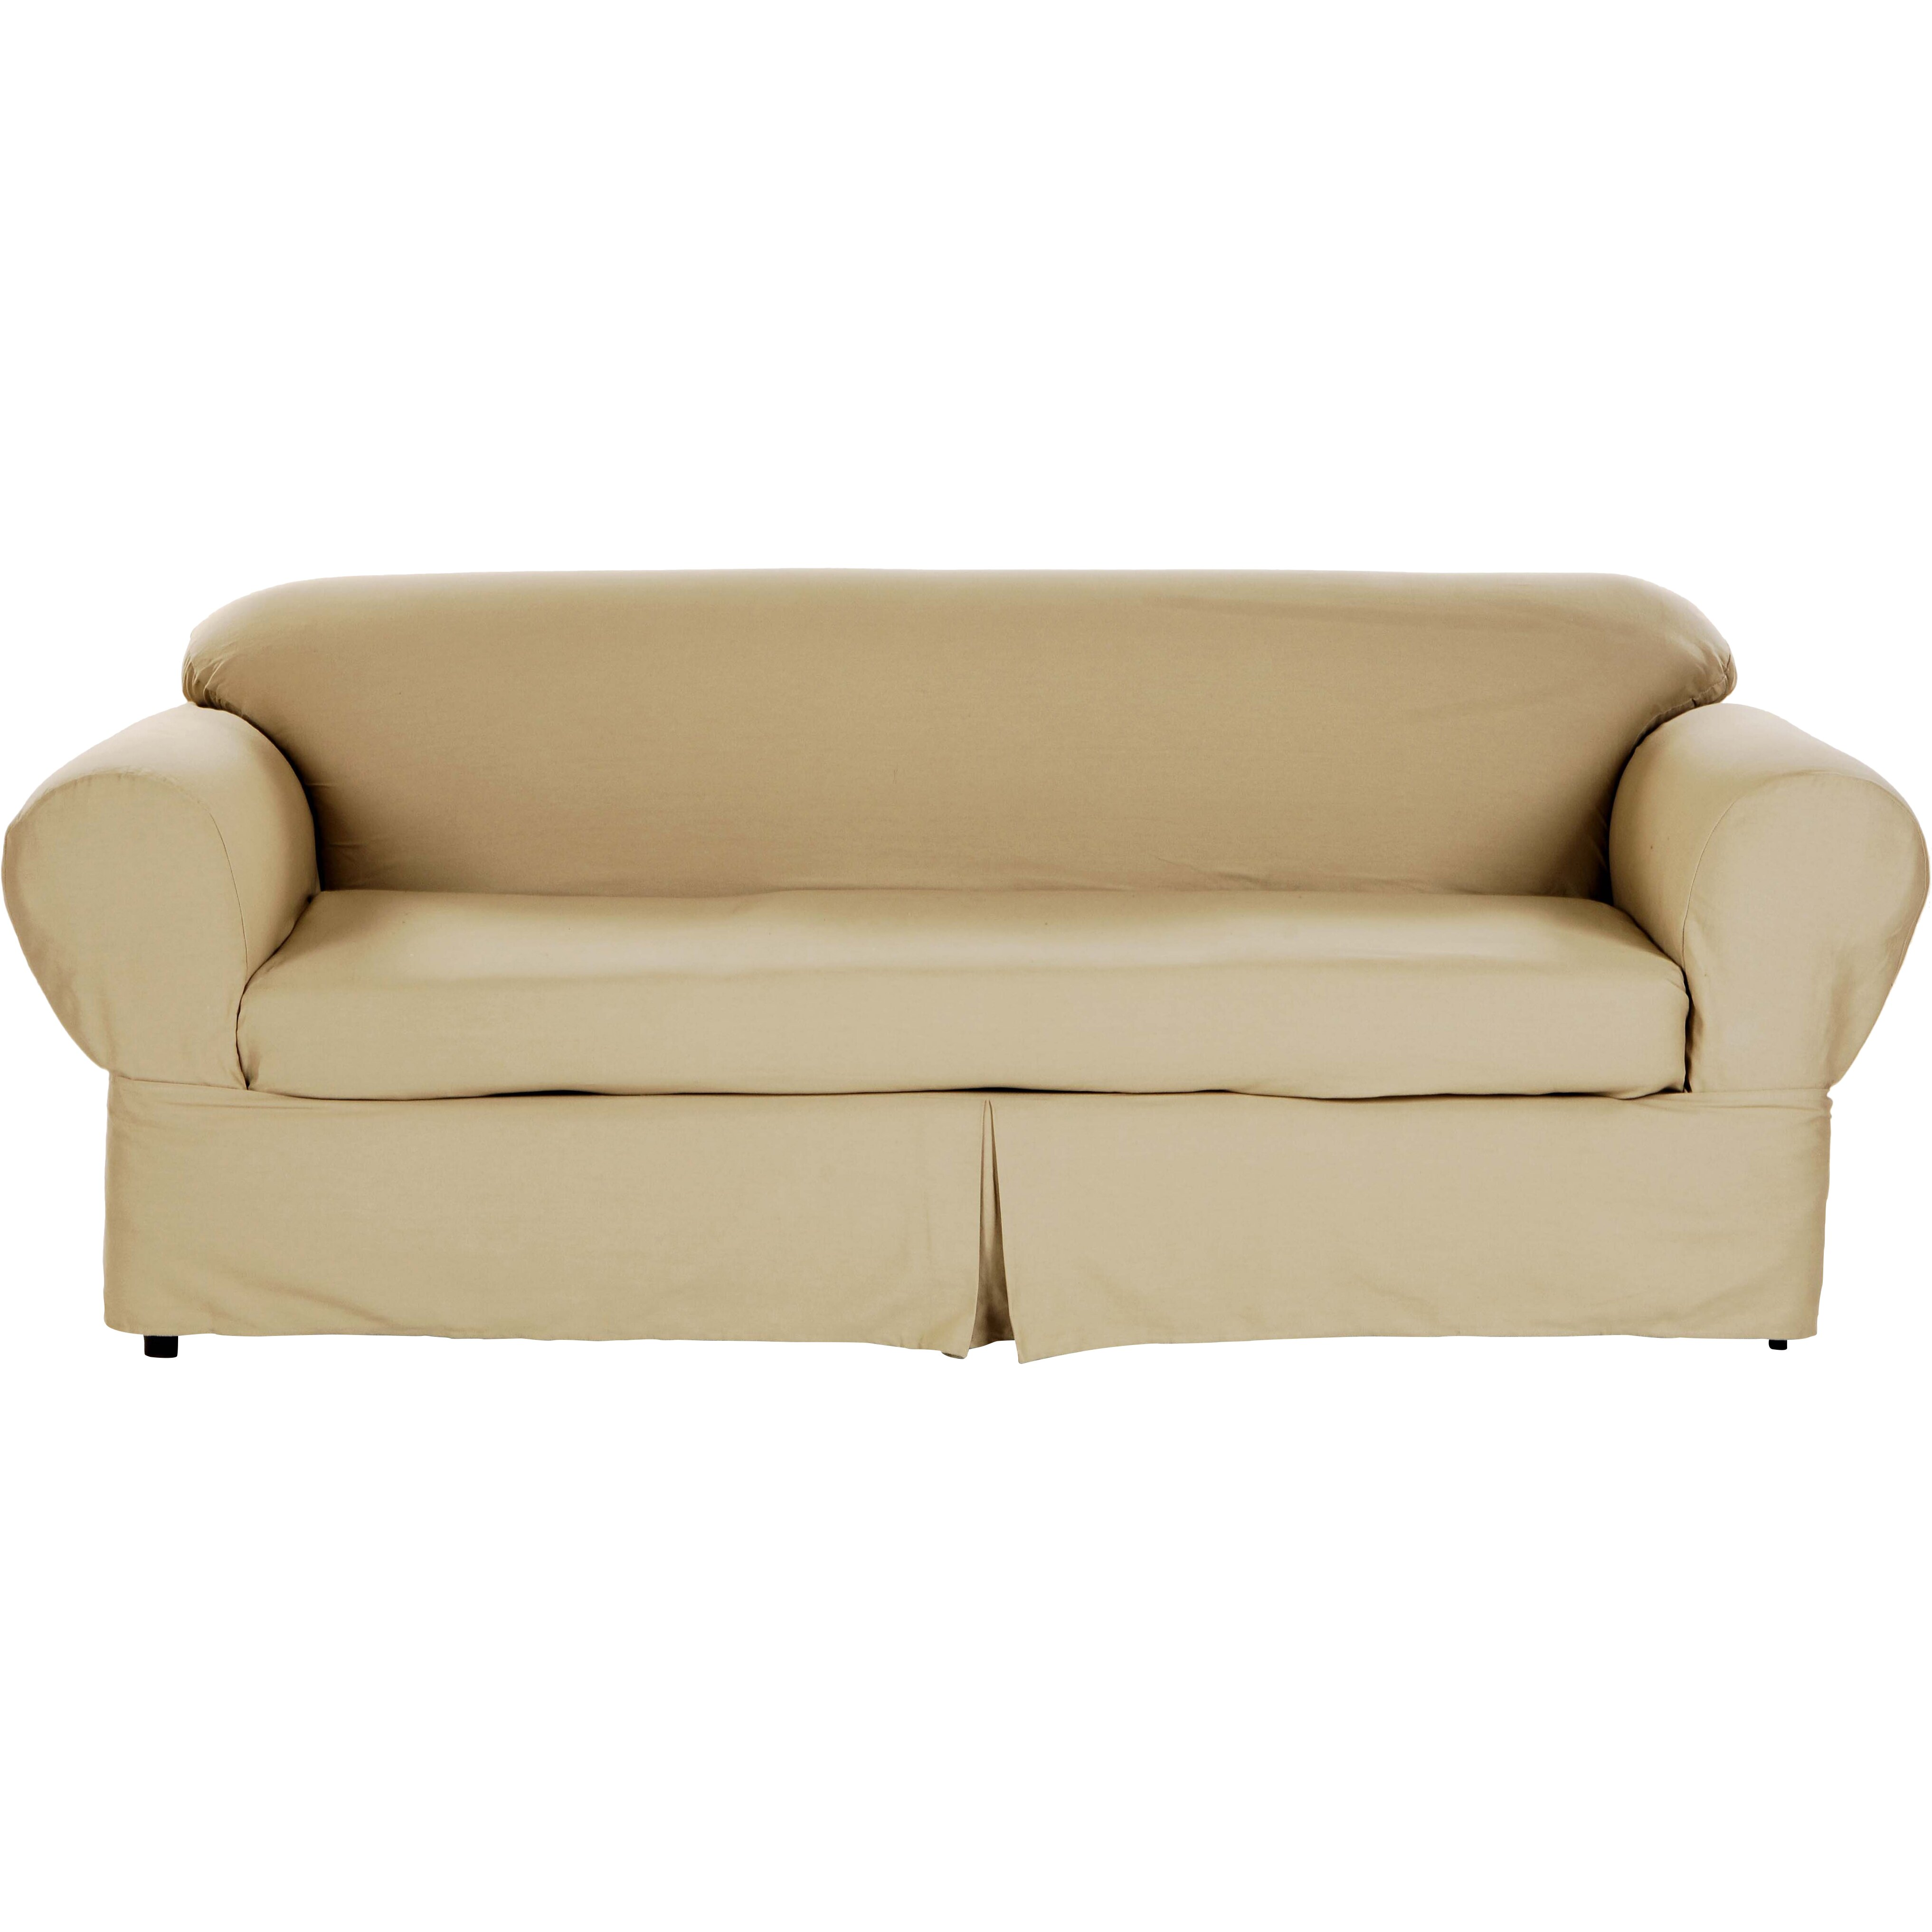 darby home co sofa slipcover reviews wayfair. Black Bedroom Furniture Sets. Home Design Ideas